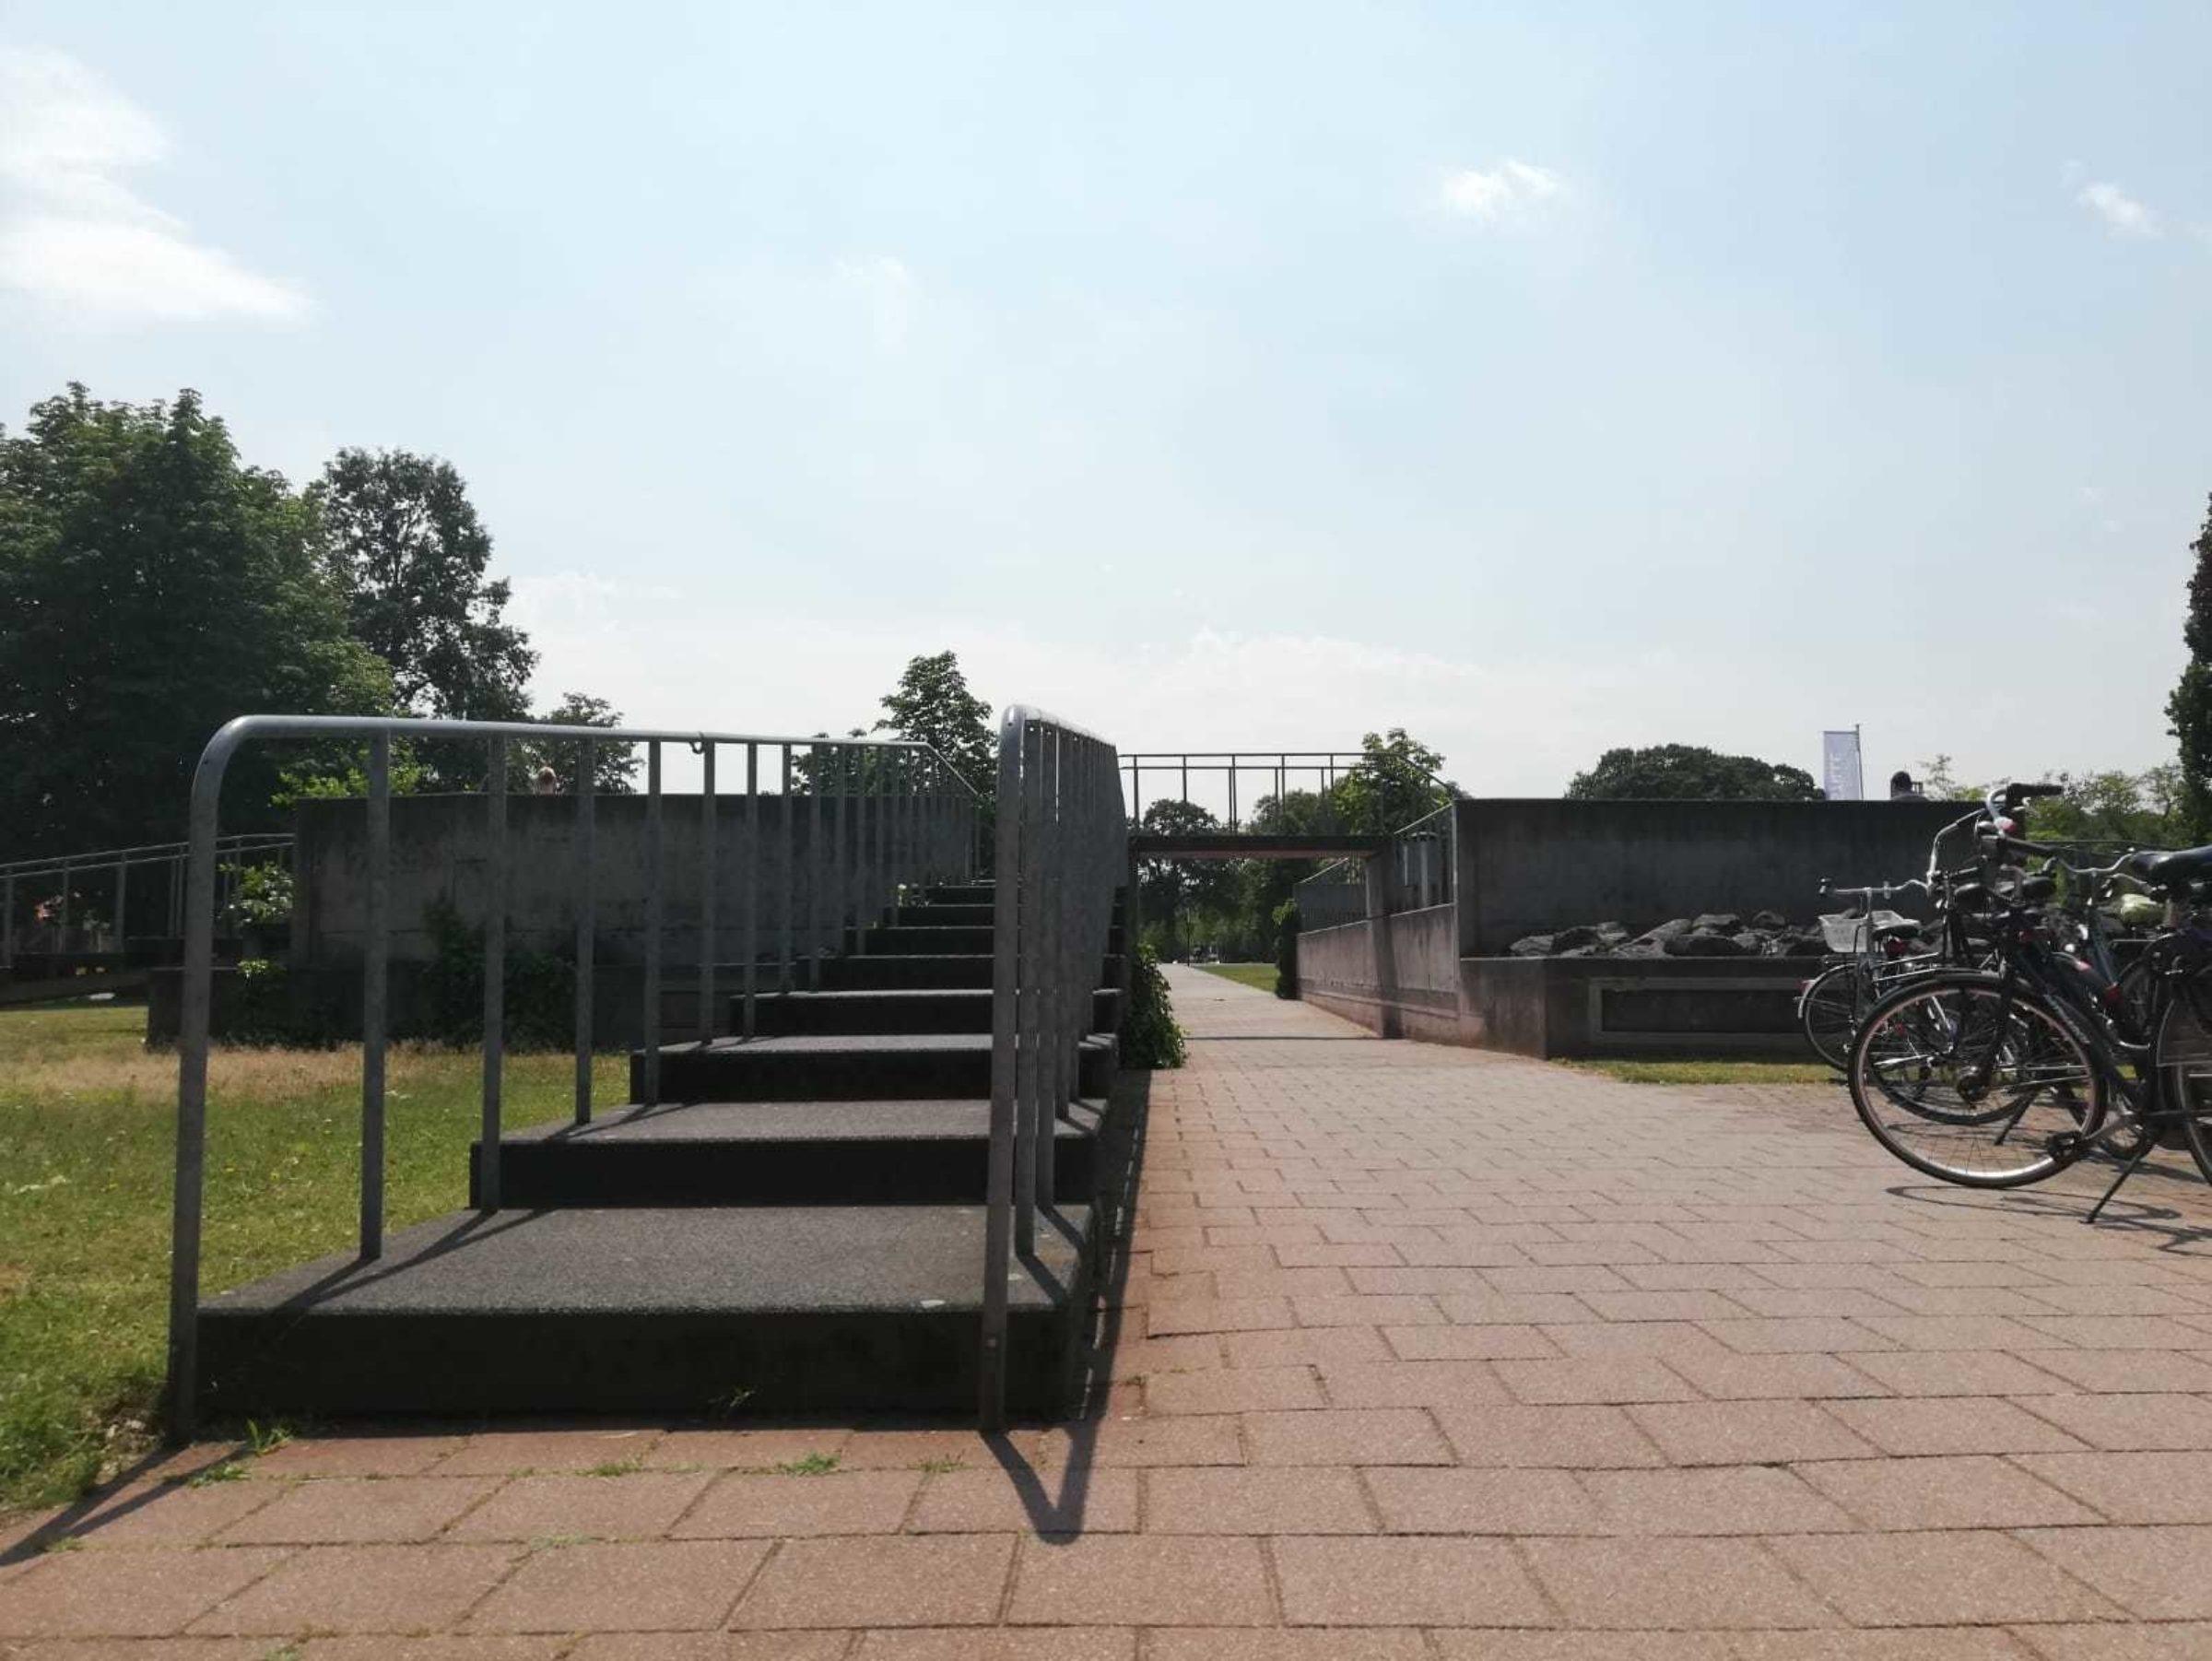 2019 Marscha Nijhuis Information Plaza